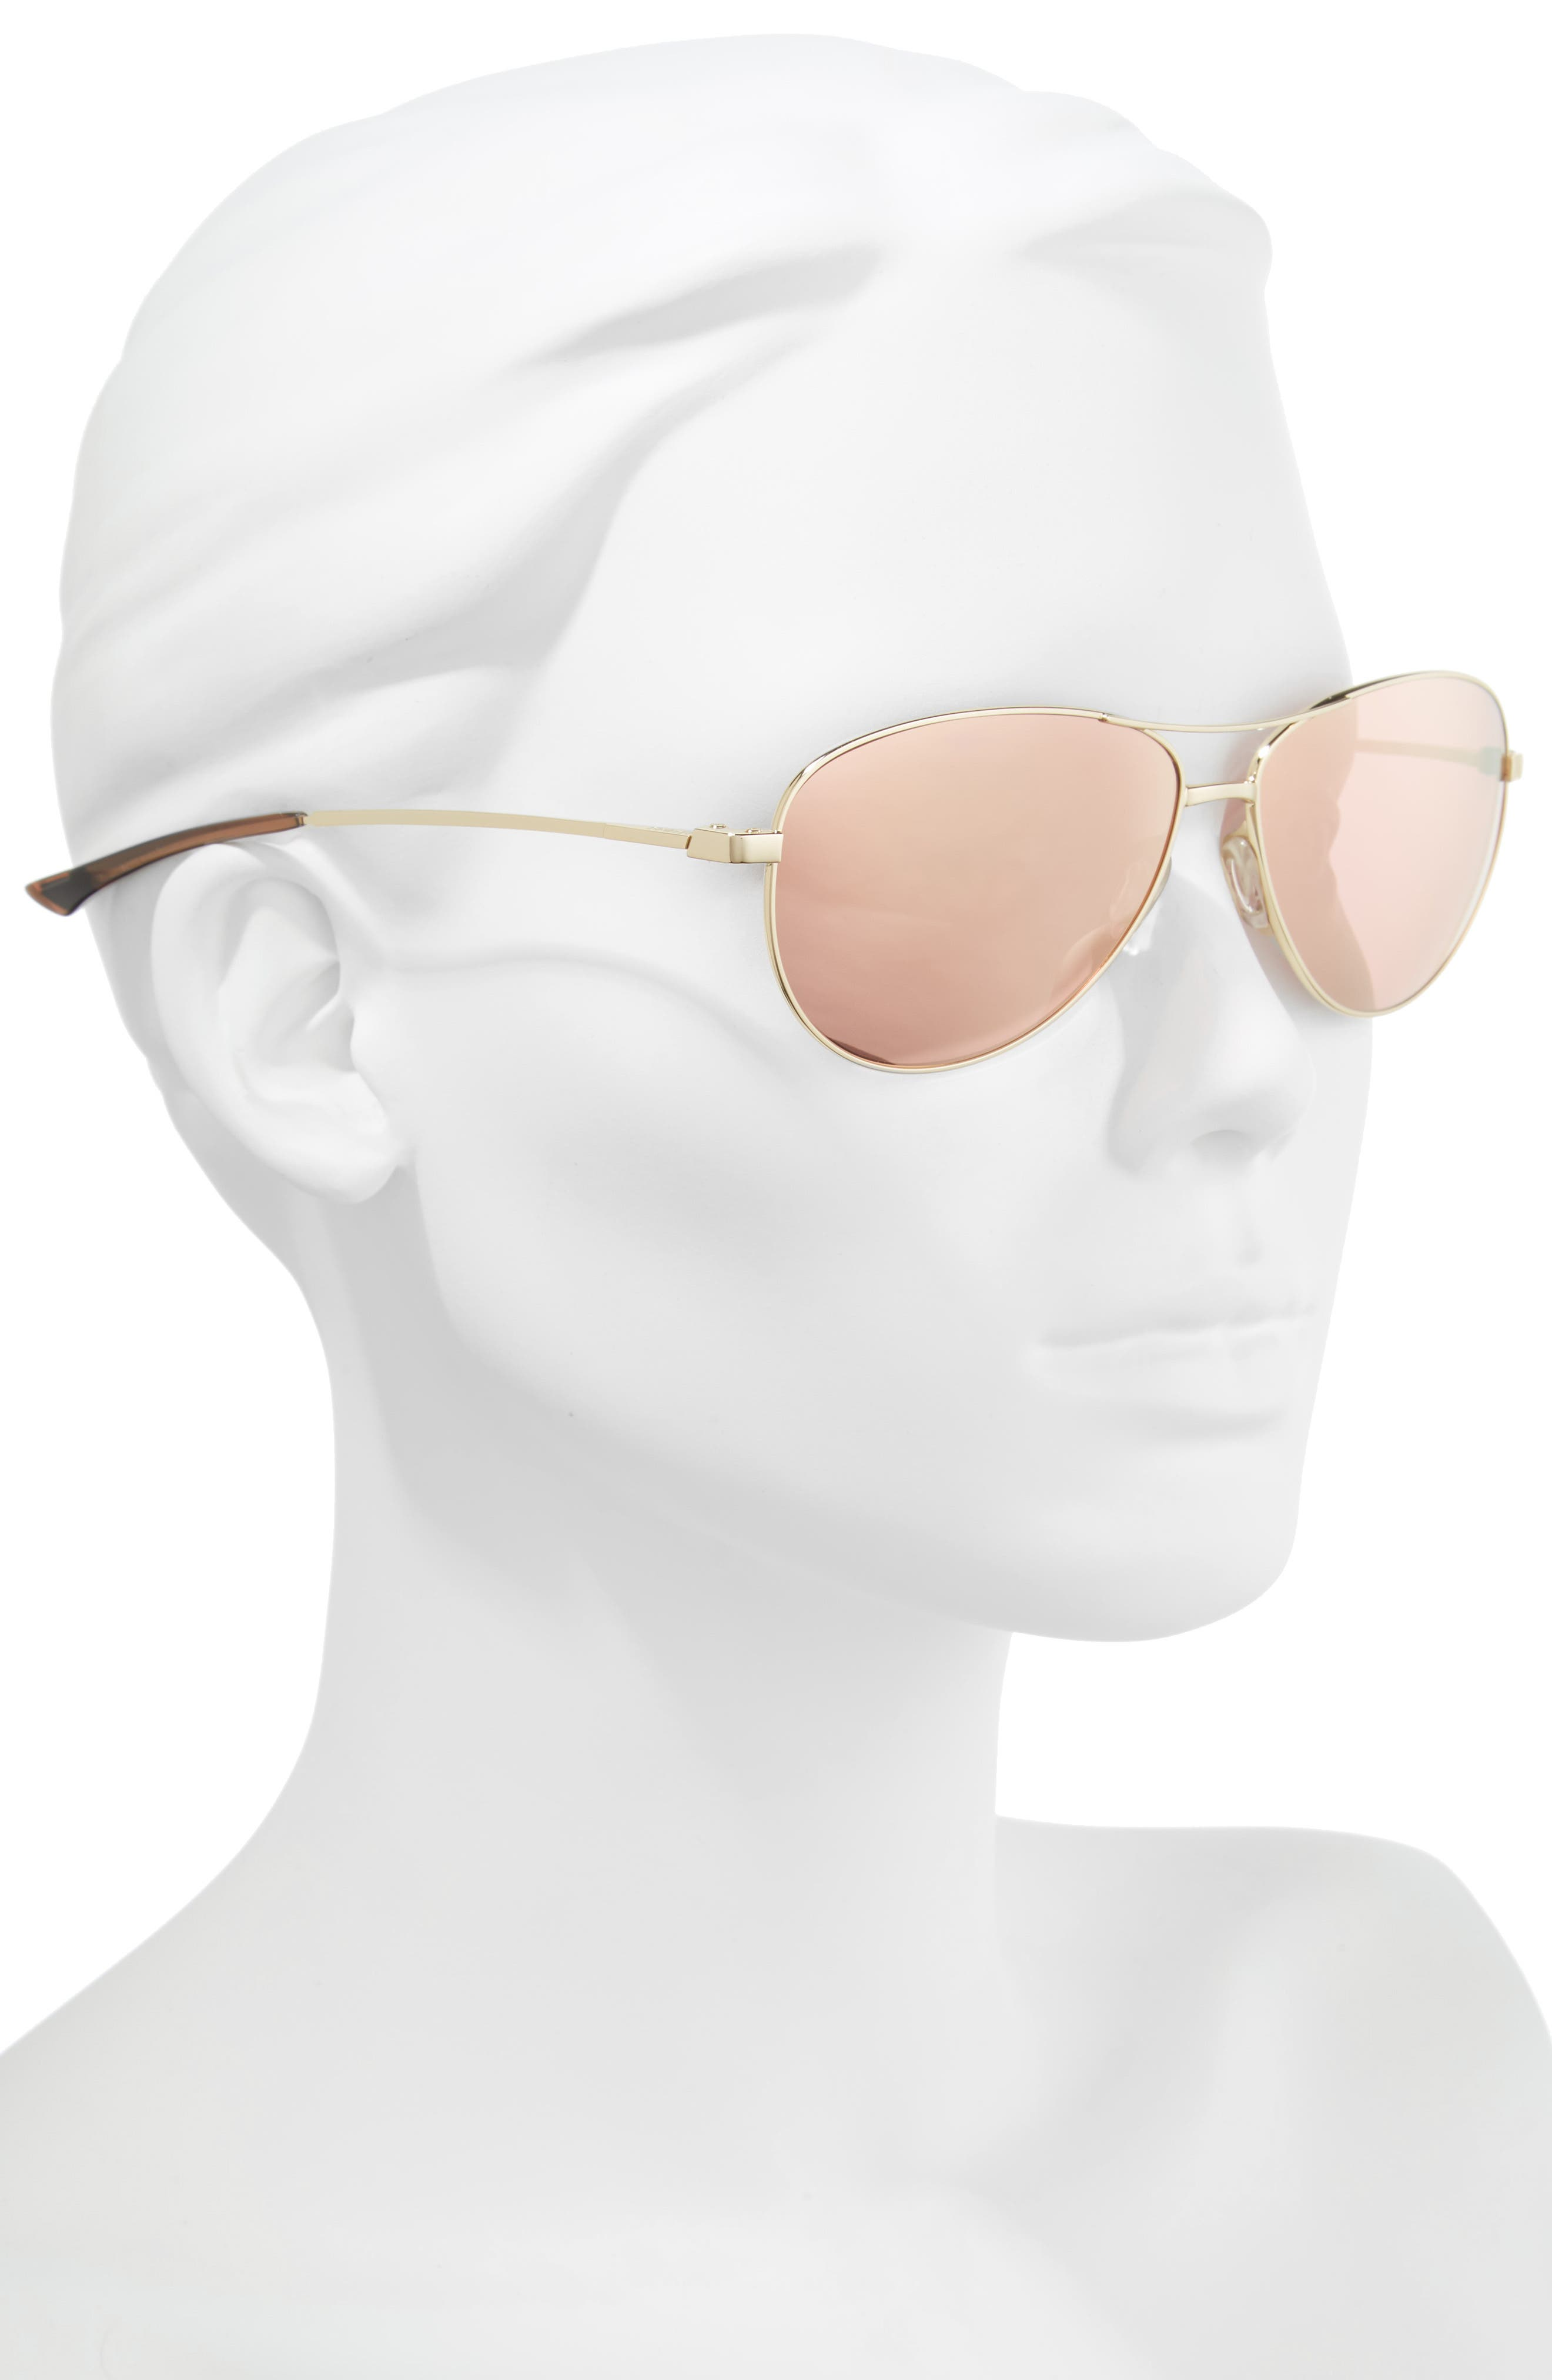 SMITH,                             'Langley' 60mm Aviator Sunglasses,                             Alternate thumbnail 2, color,                             GOLD